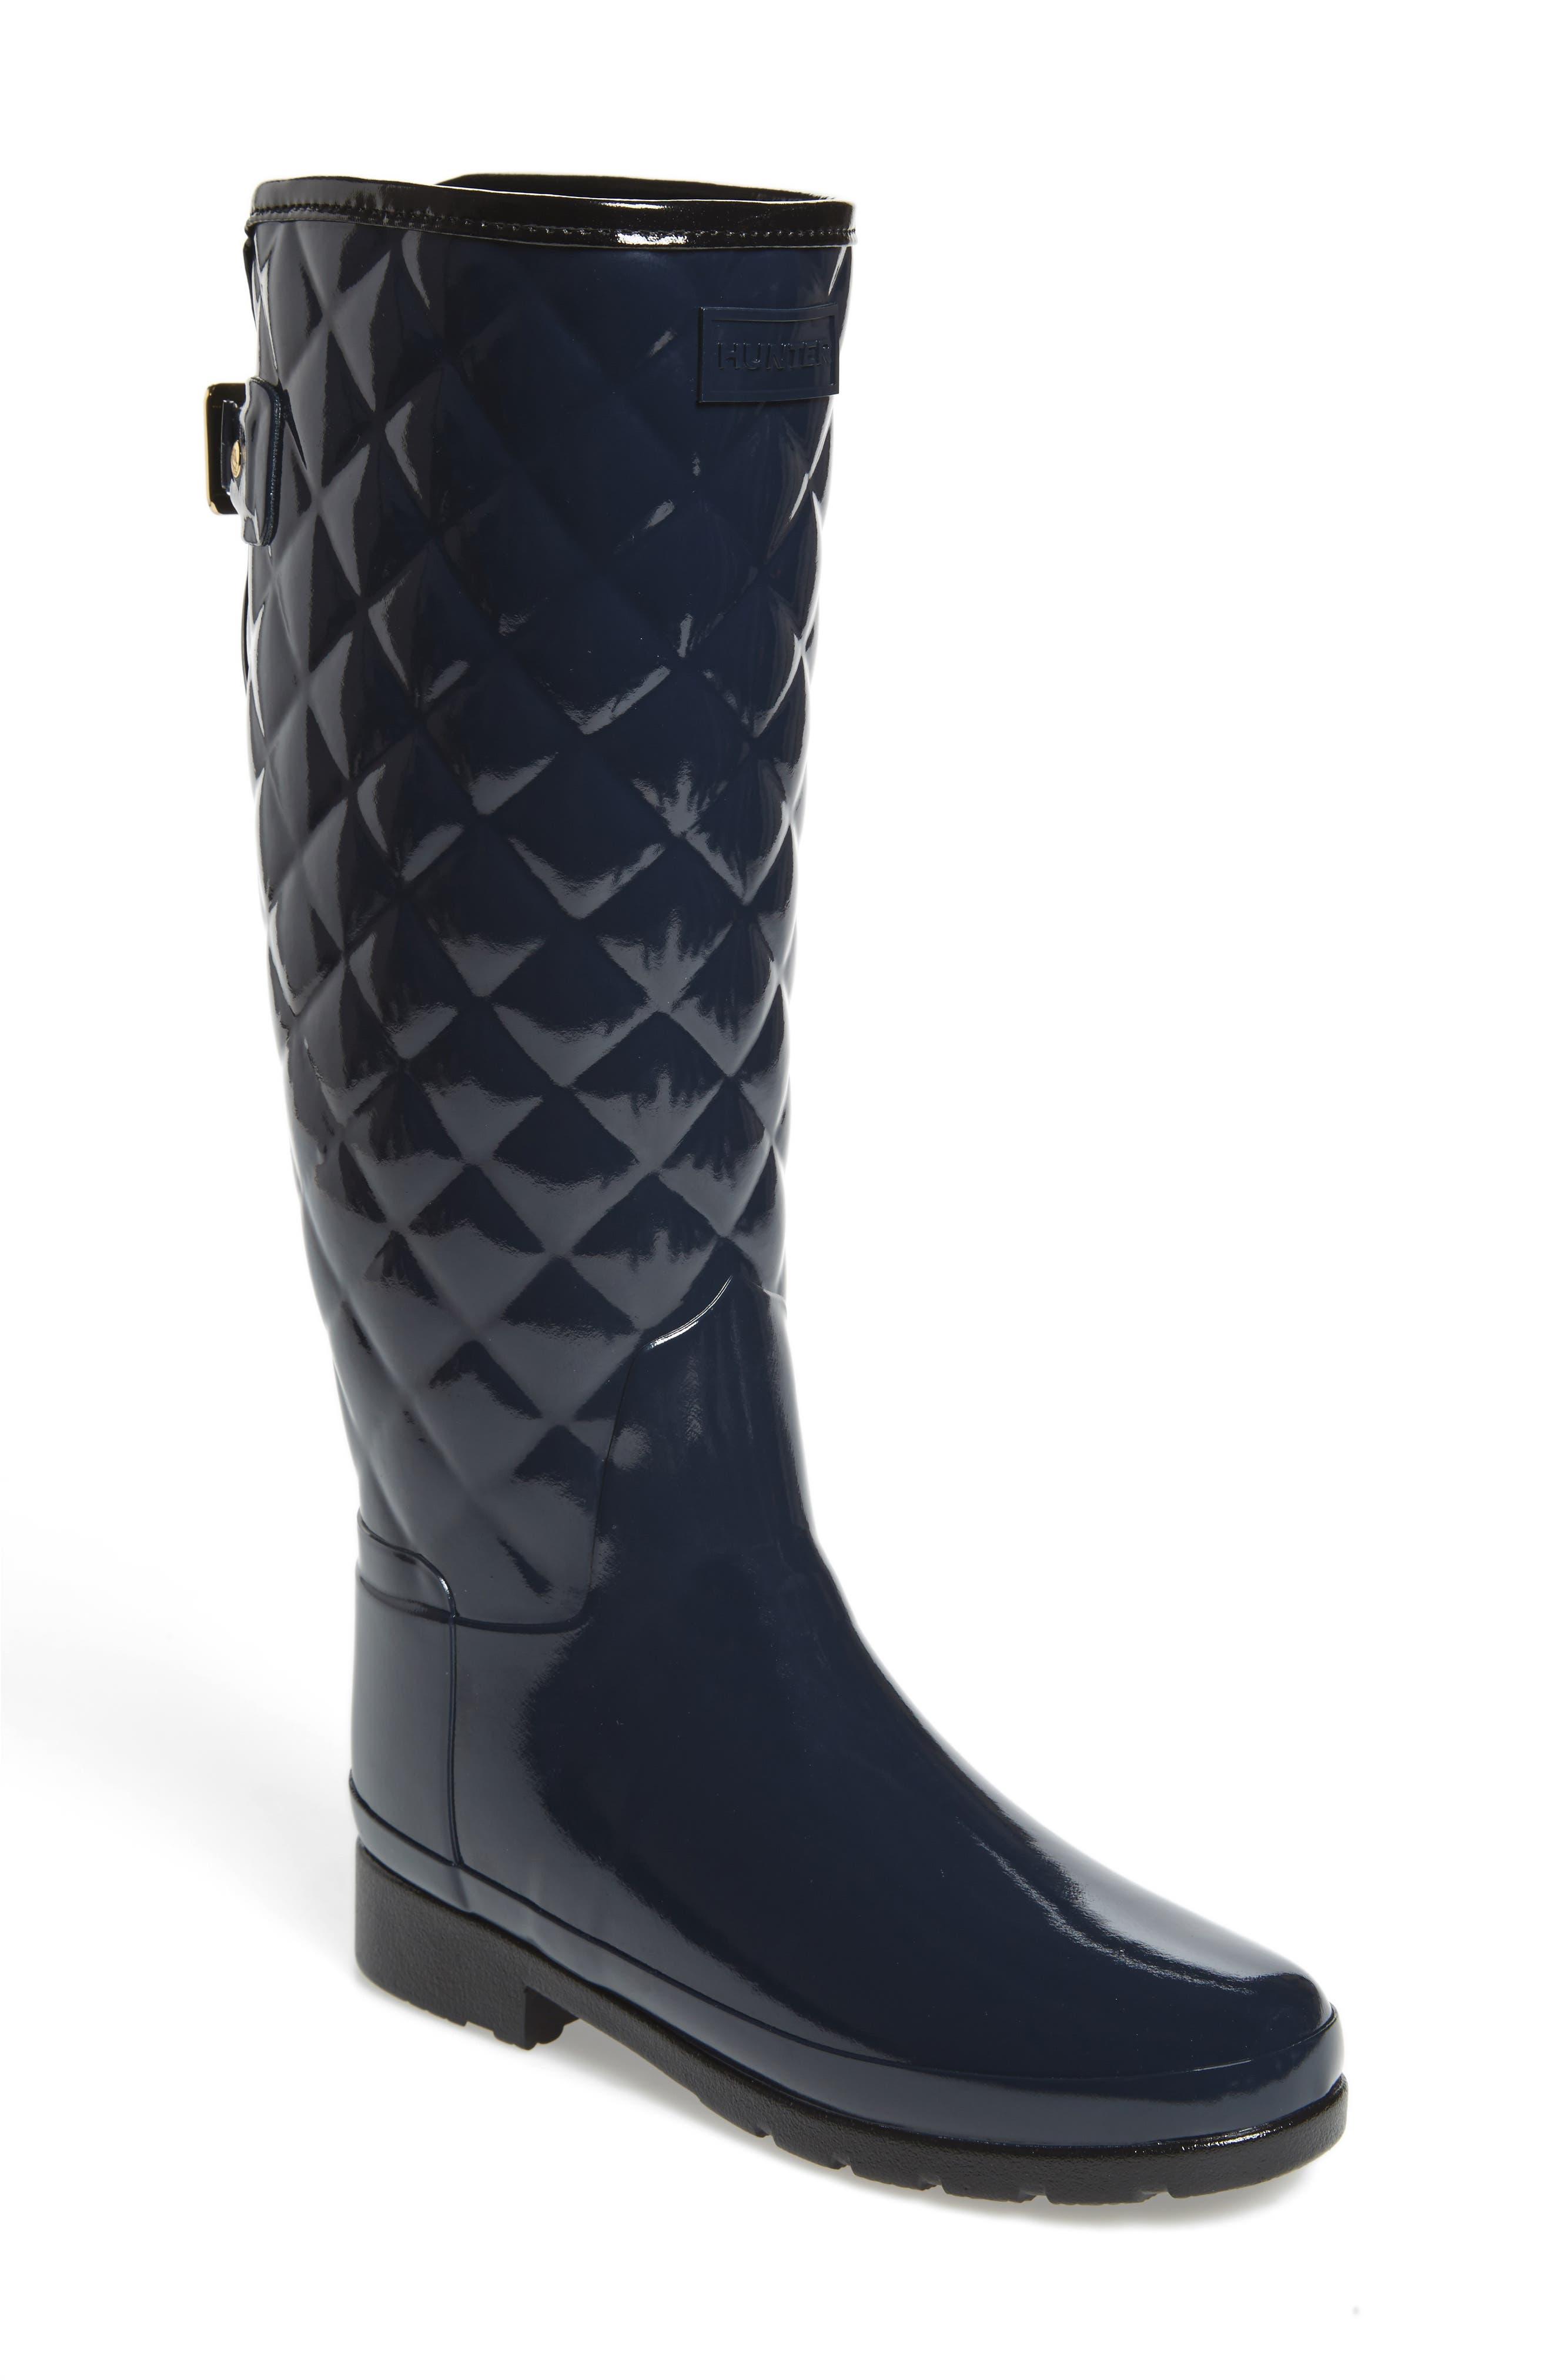 Main Image - Hunter Original Refined High Gloss Quilted Rain Boot (Women)